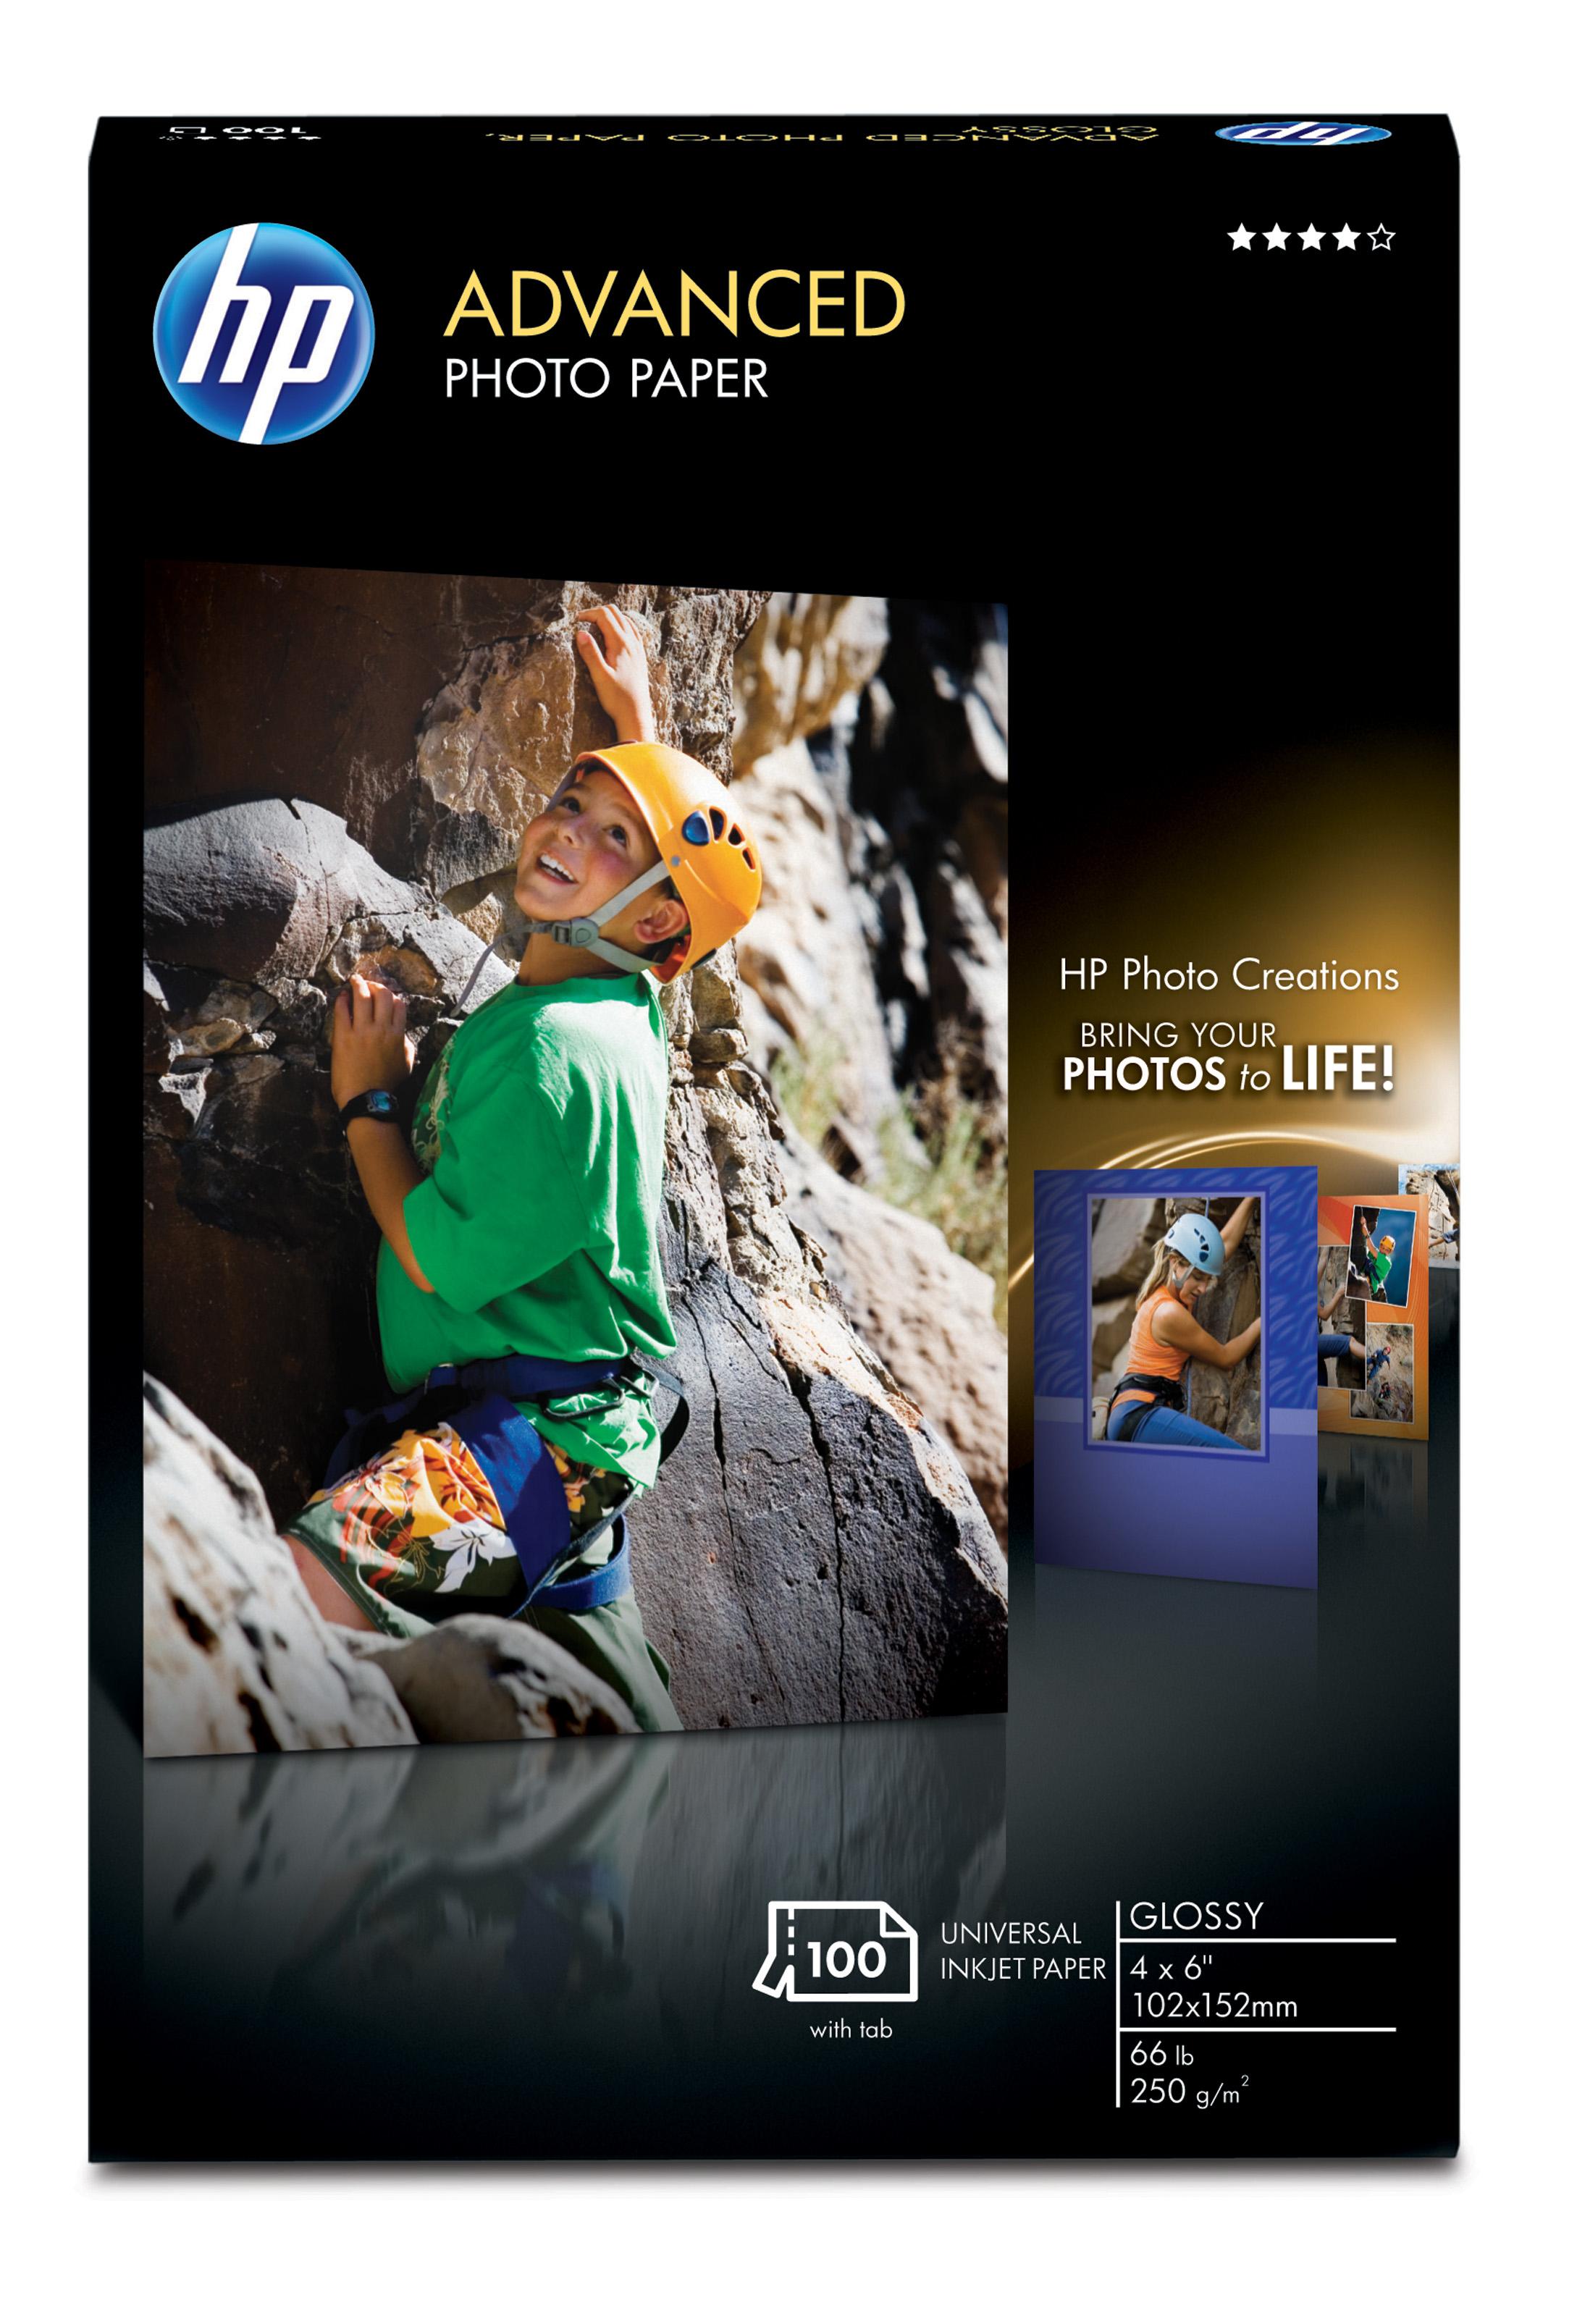 HP Advanced Glossy Photo Paper-100 sht/4 x 6 in borderless carta fotografica